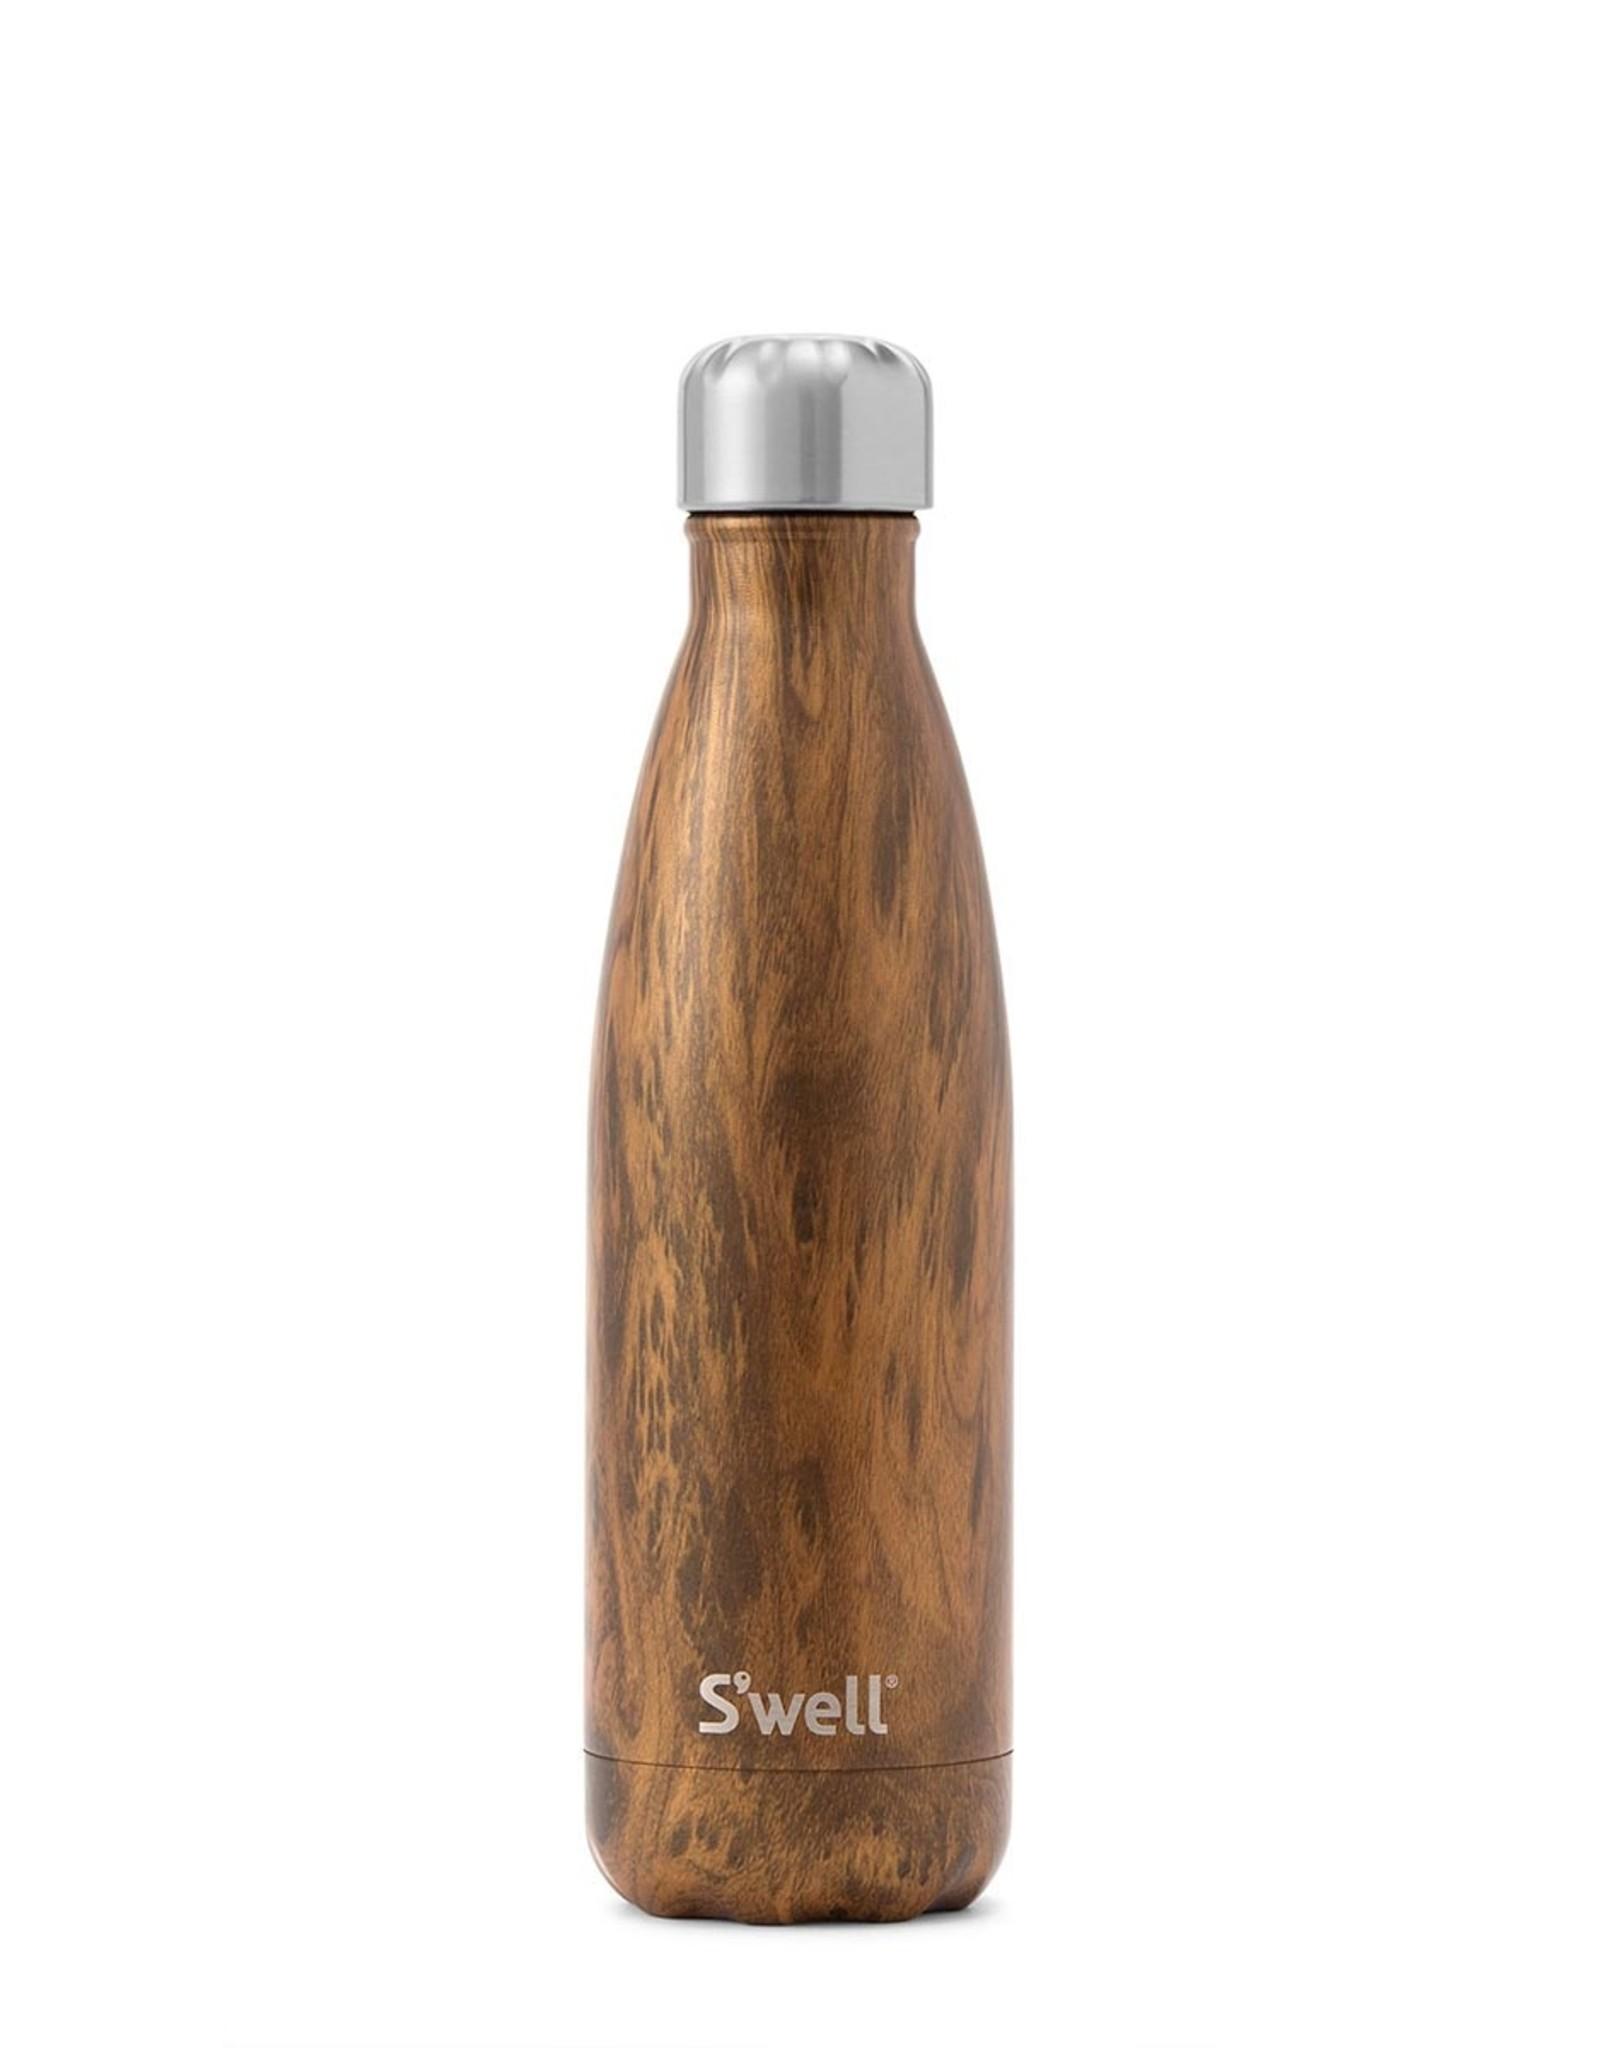 S'well S'well Teakwood Bottle 17 oz